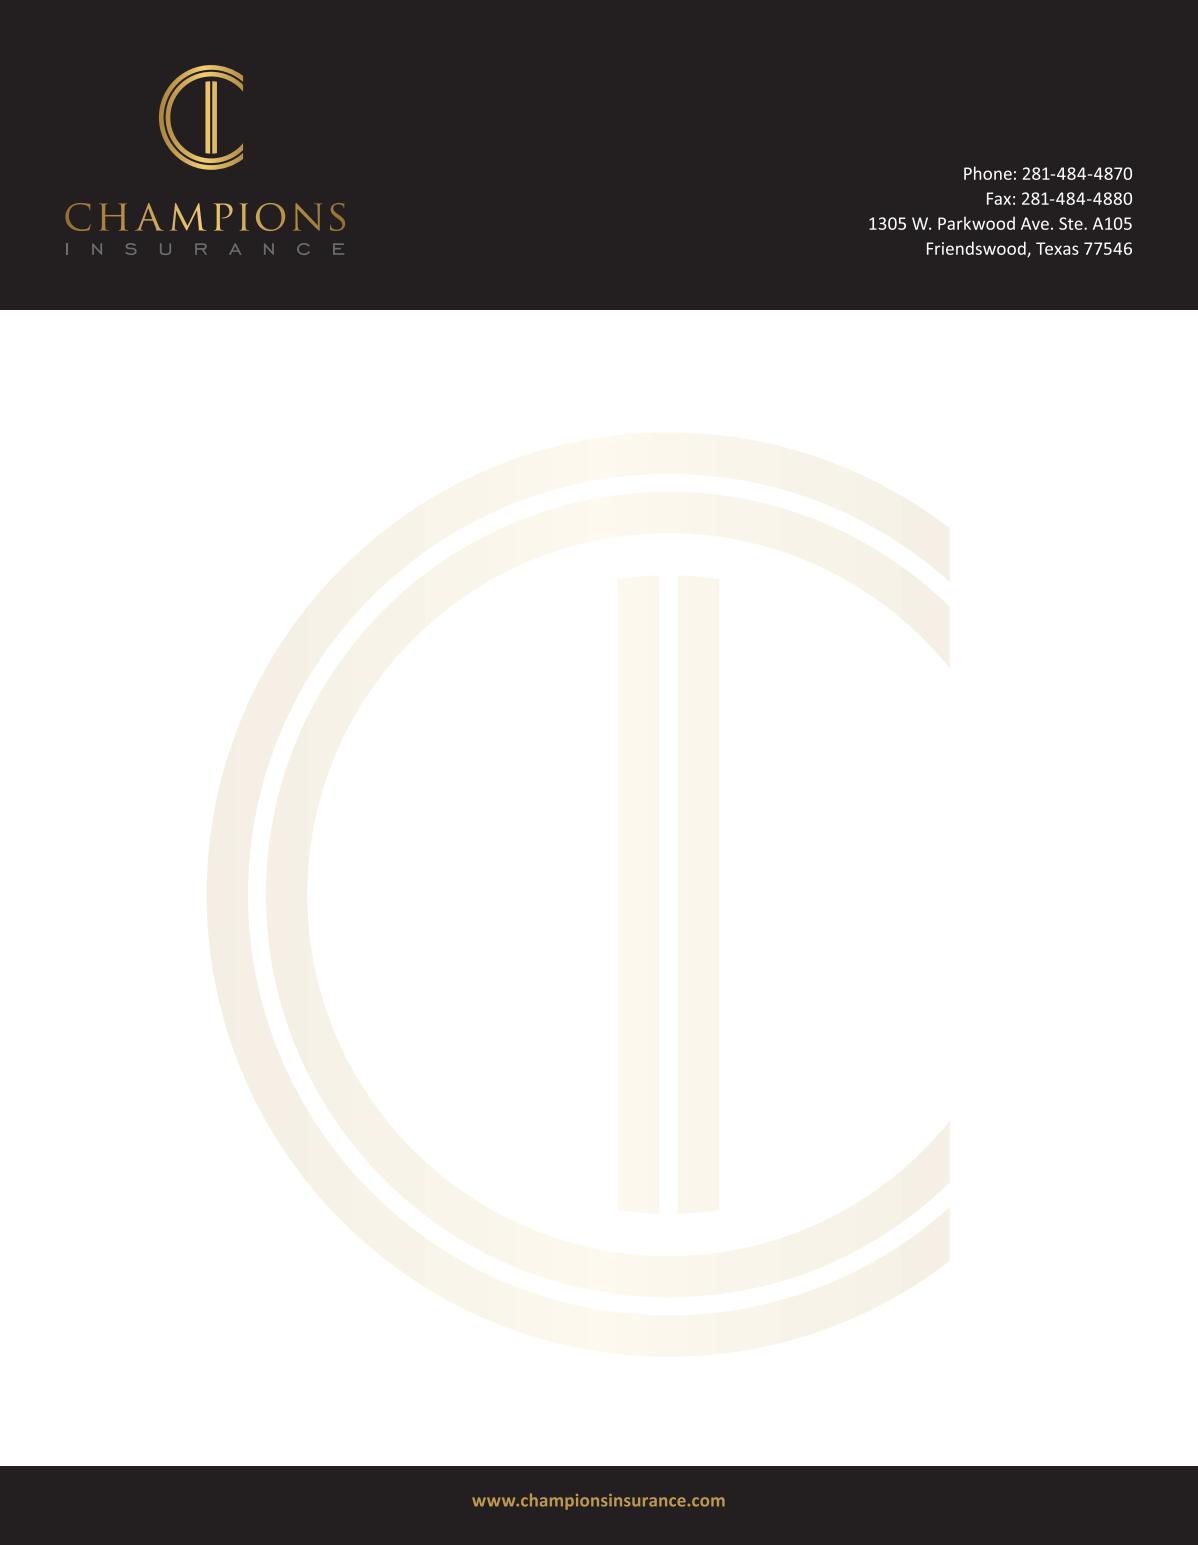 Letterhead & envelopes with New logo